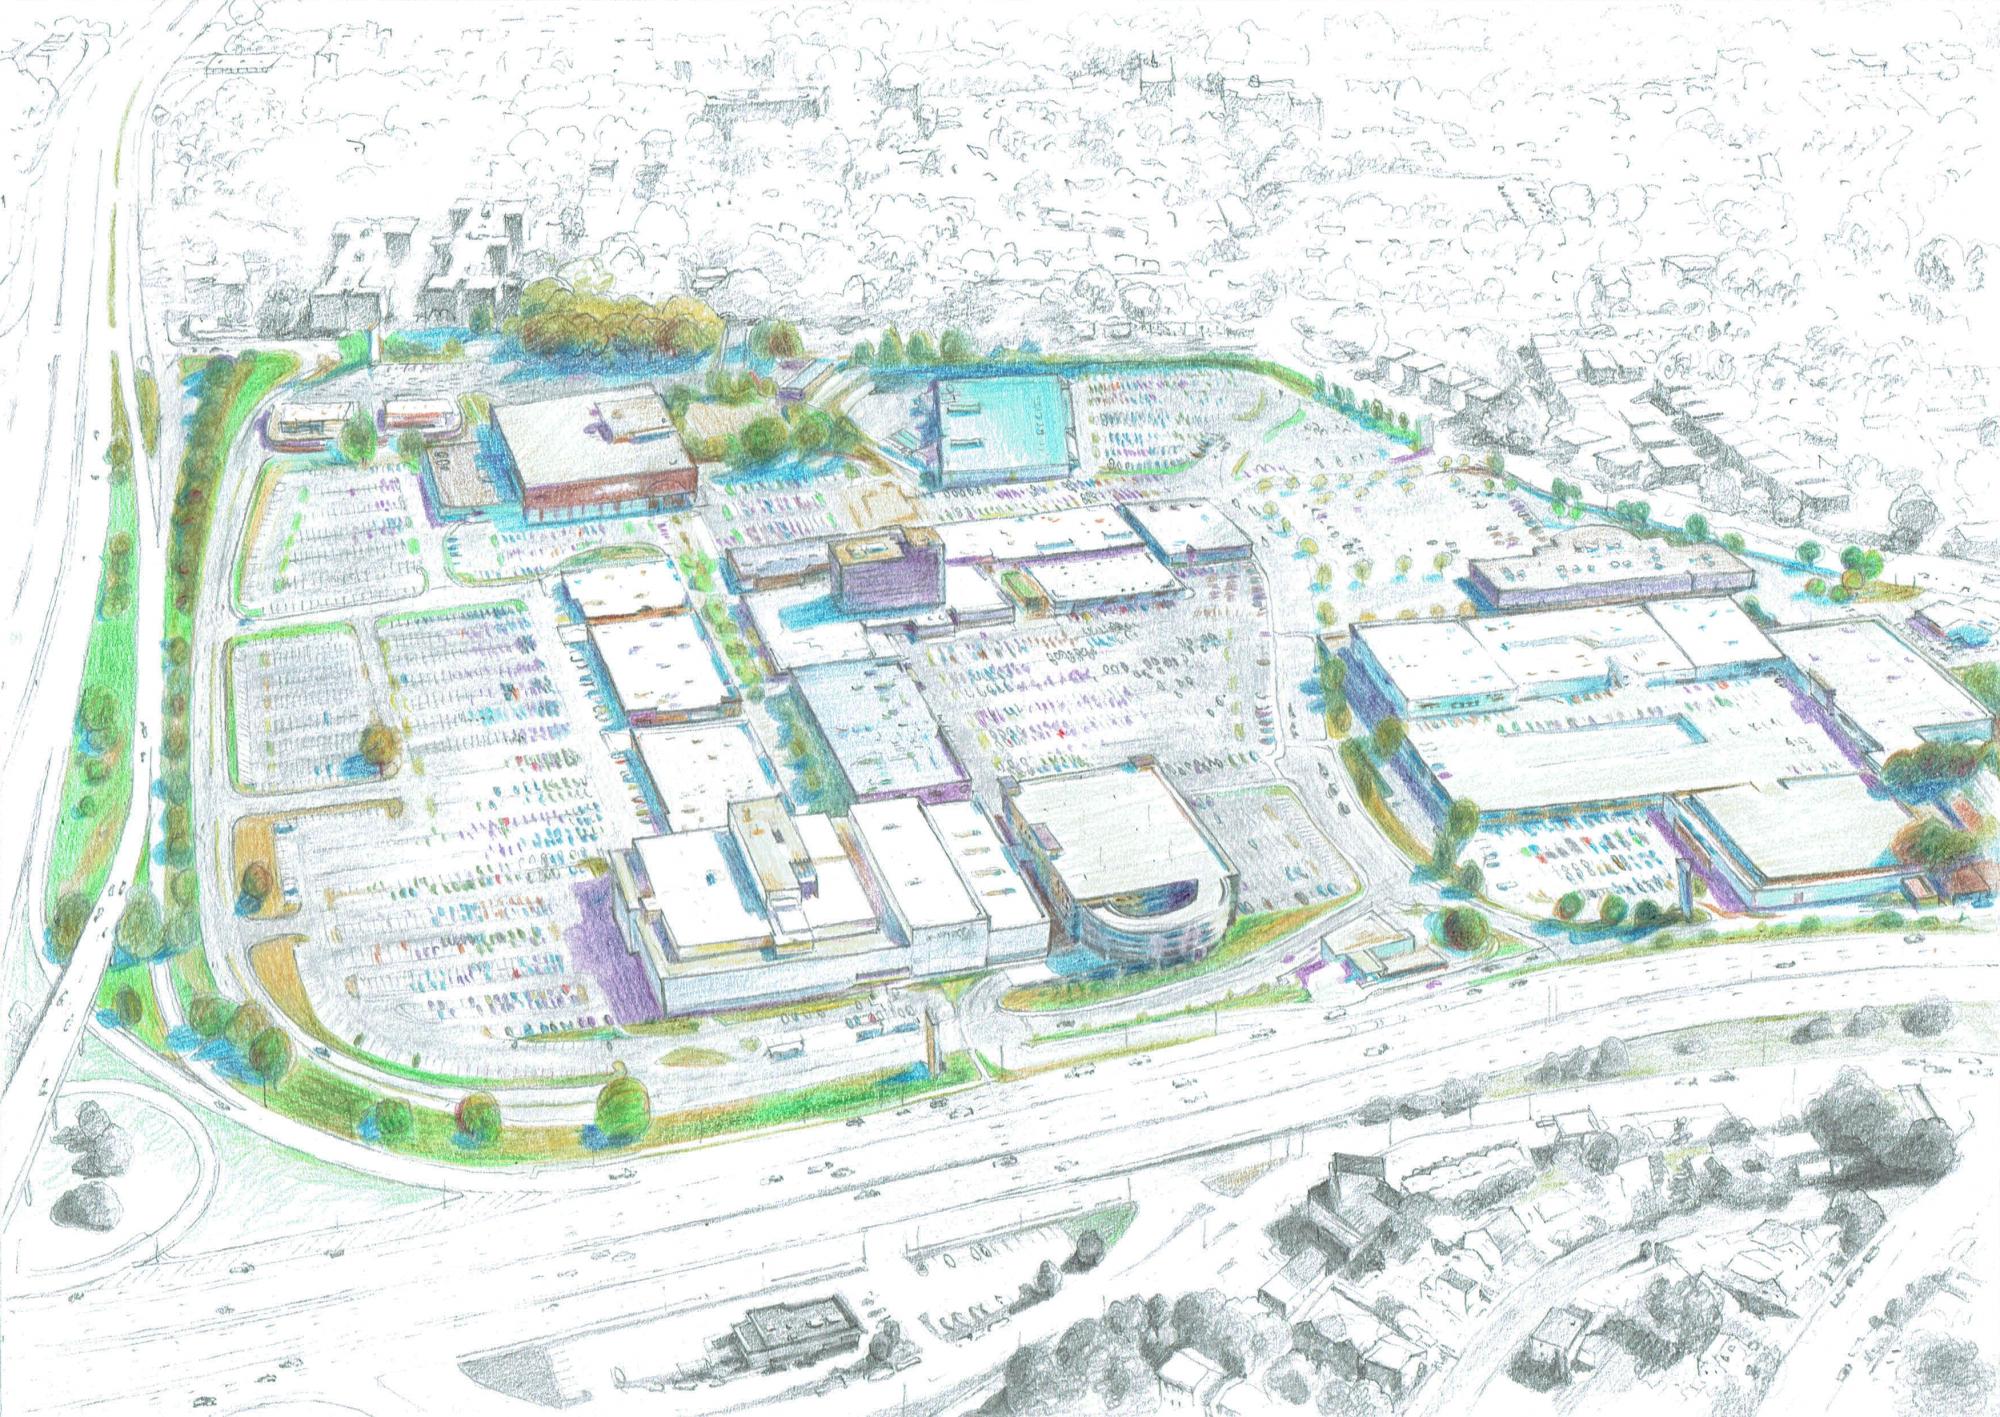 Cross County Mall Regeneration Project